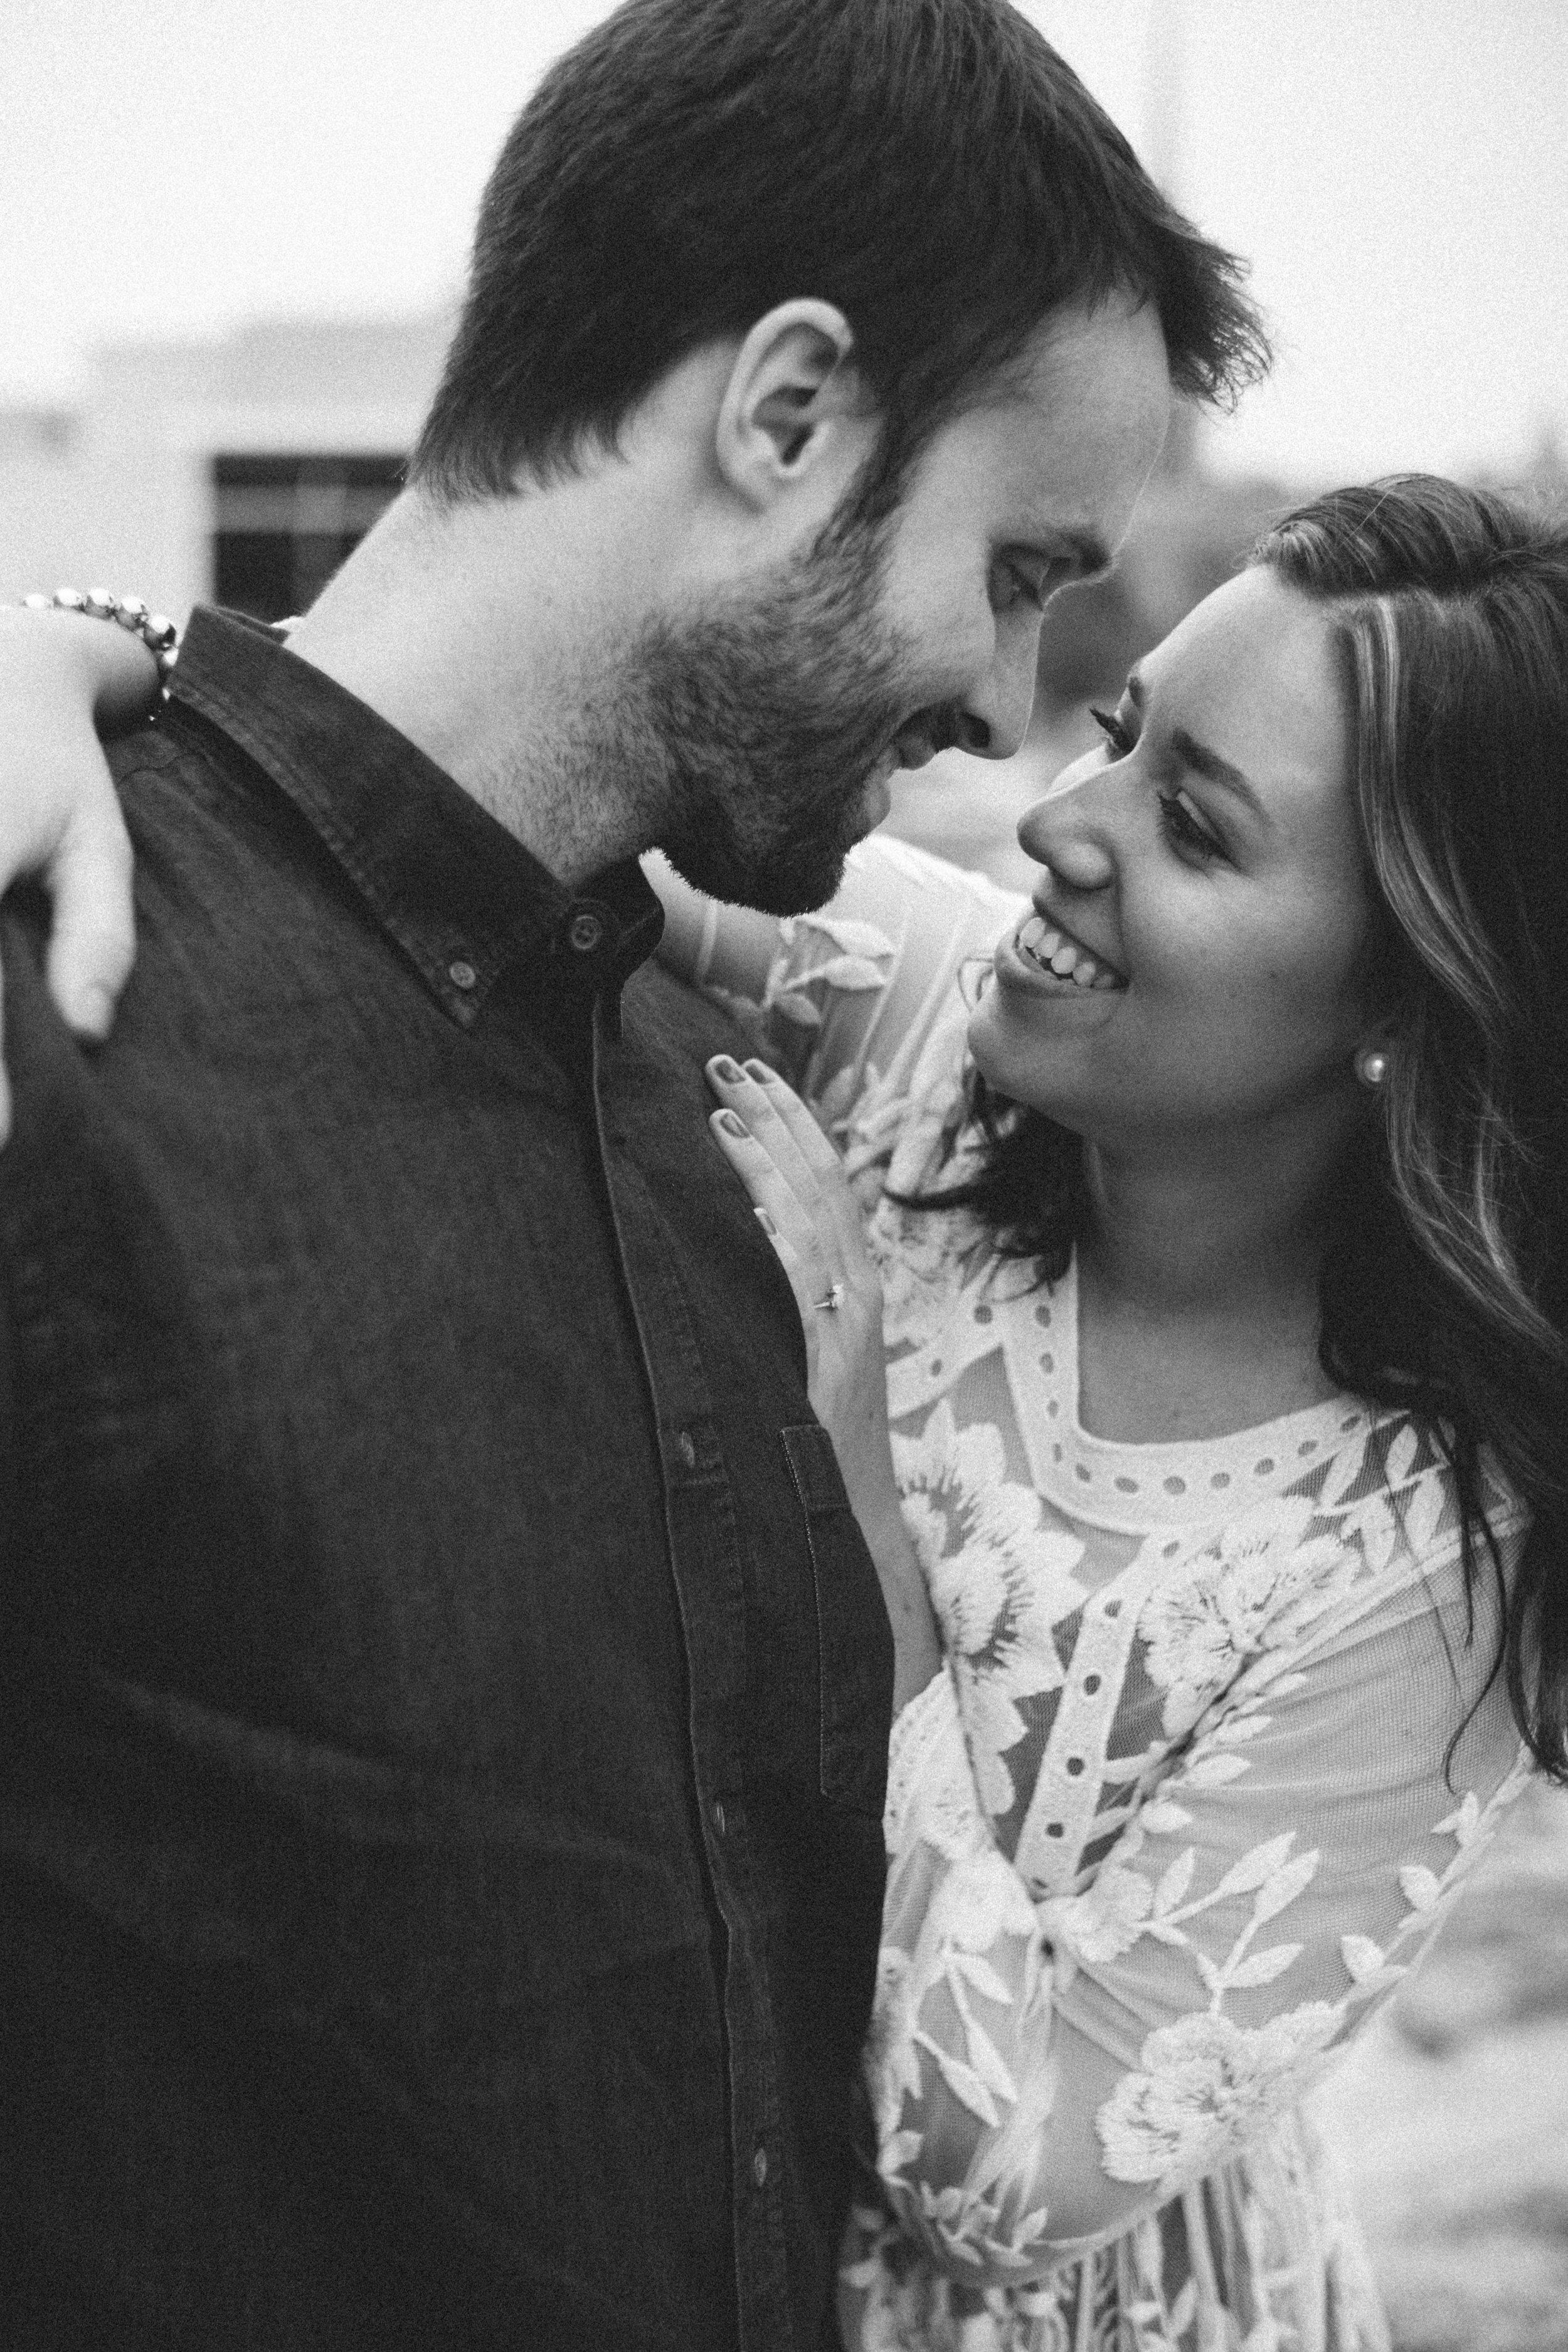 Lauren_Nick_Manzer_Bailey_Engagement_Photos_0127.jpg